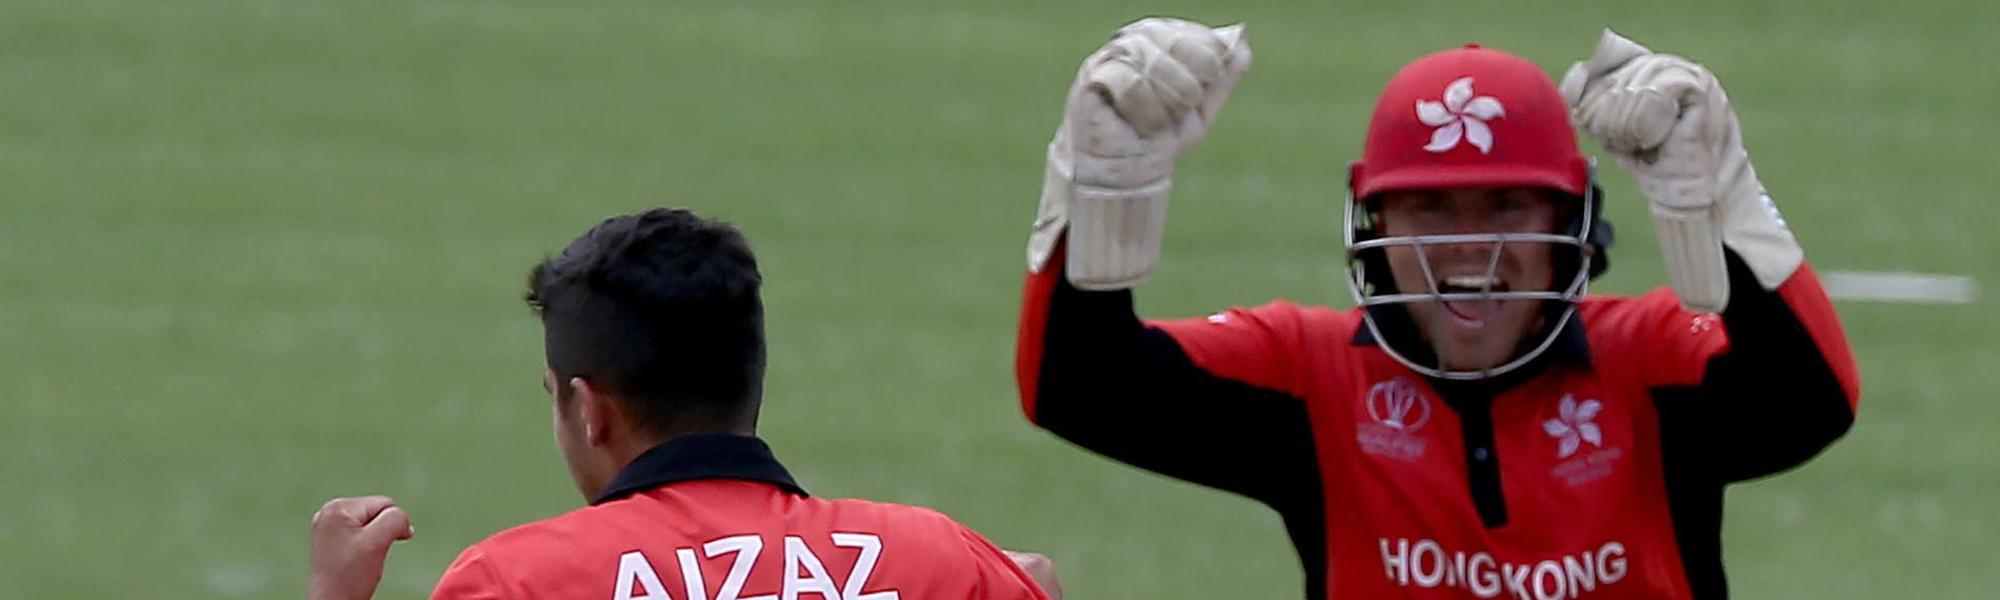 Aizaz Khan (lead)